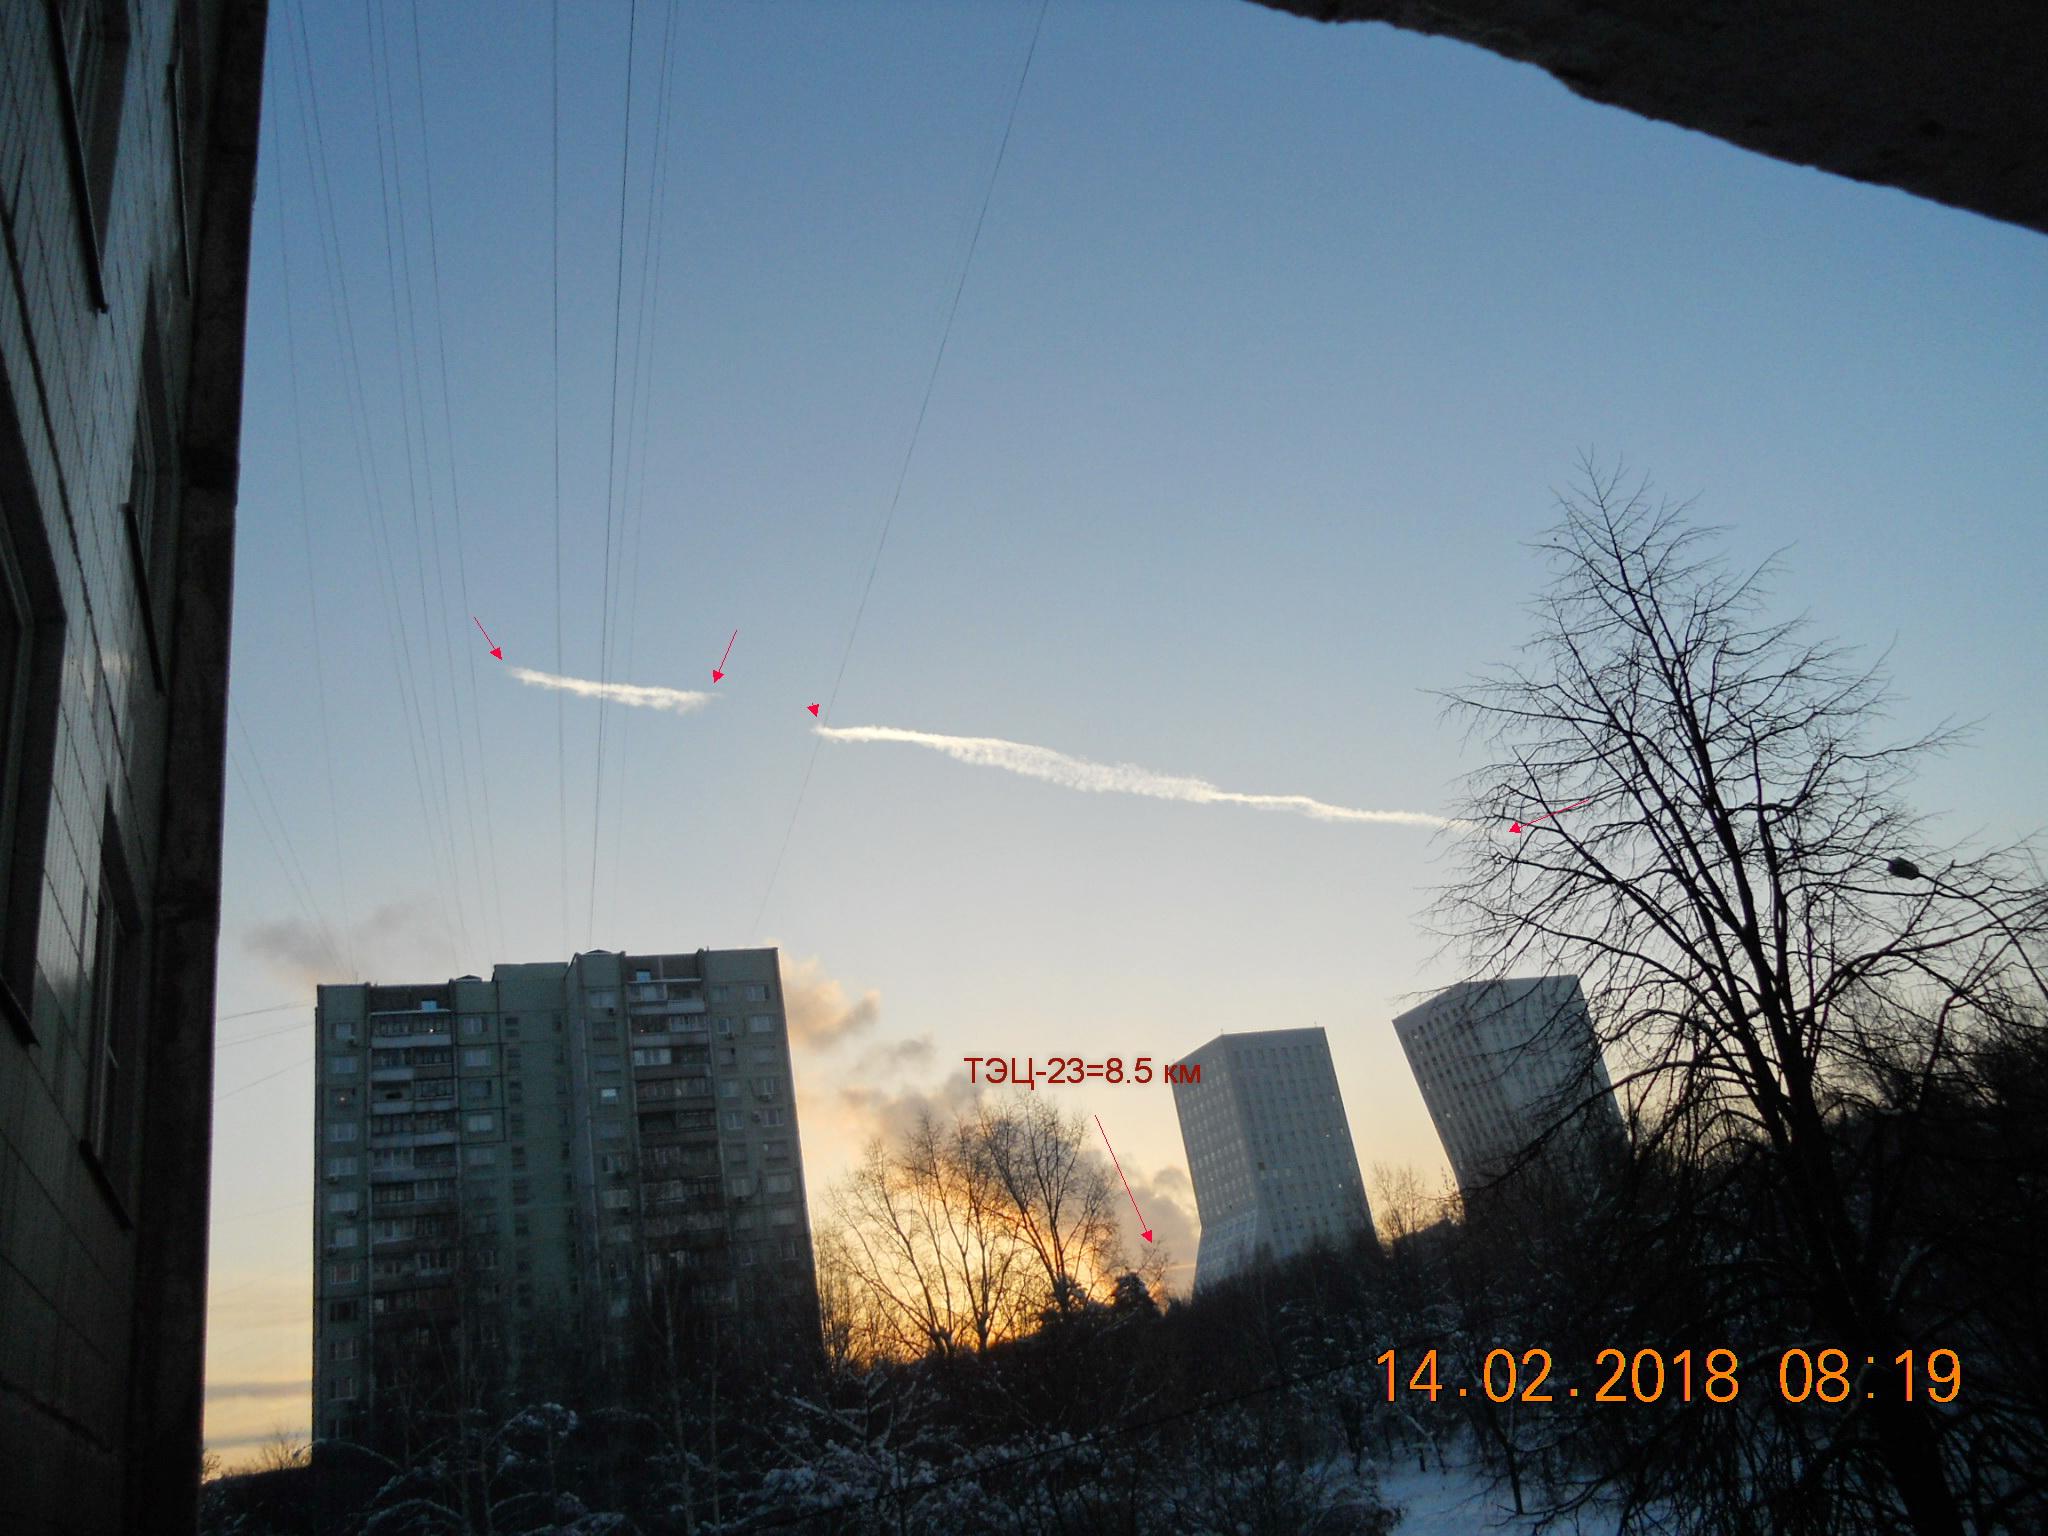 http://images.vfl.ru/ii/1518587331/c1628fa3/20578591.jpg